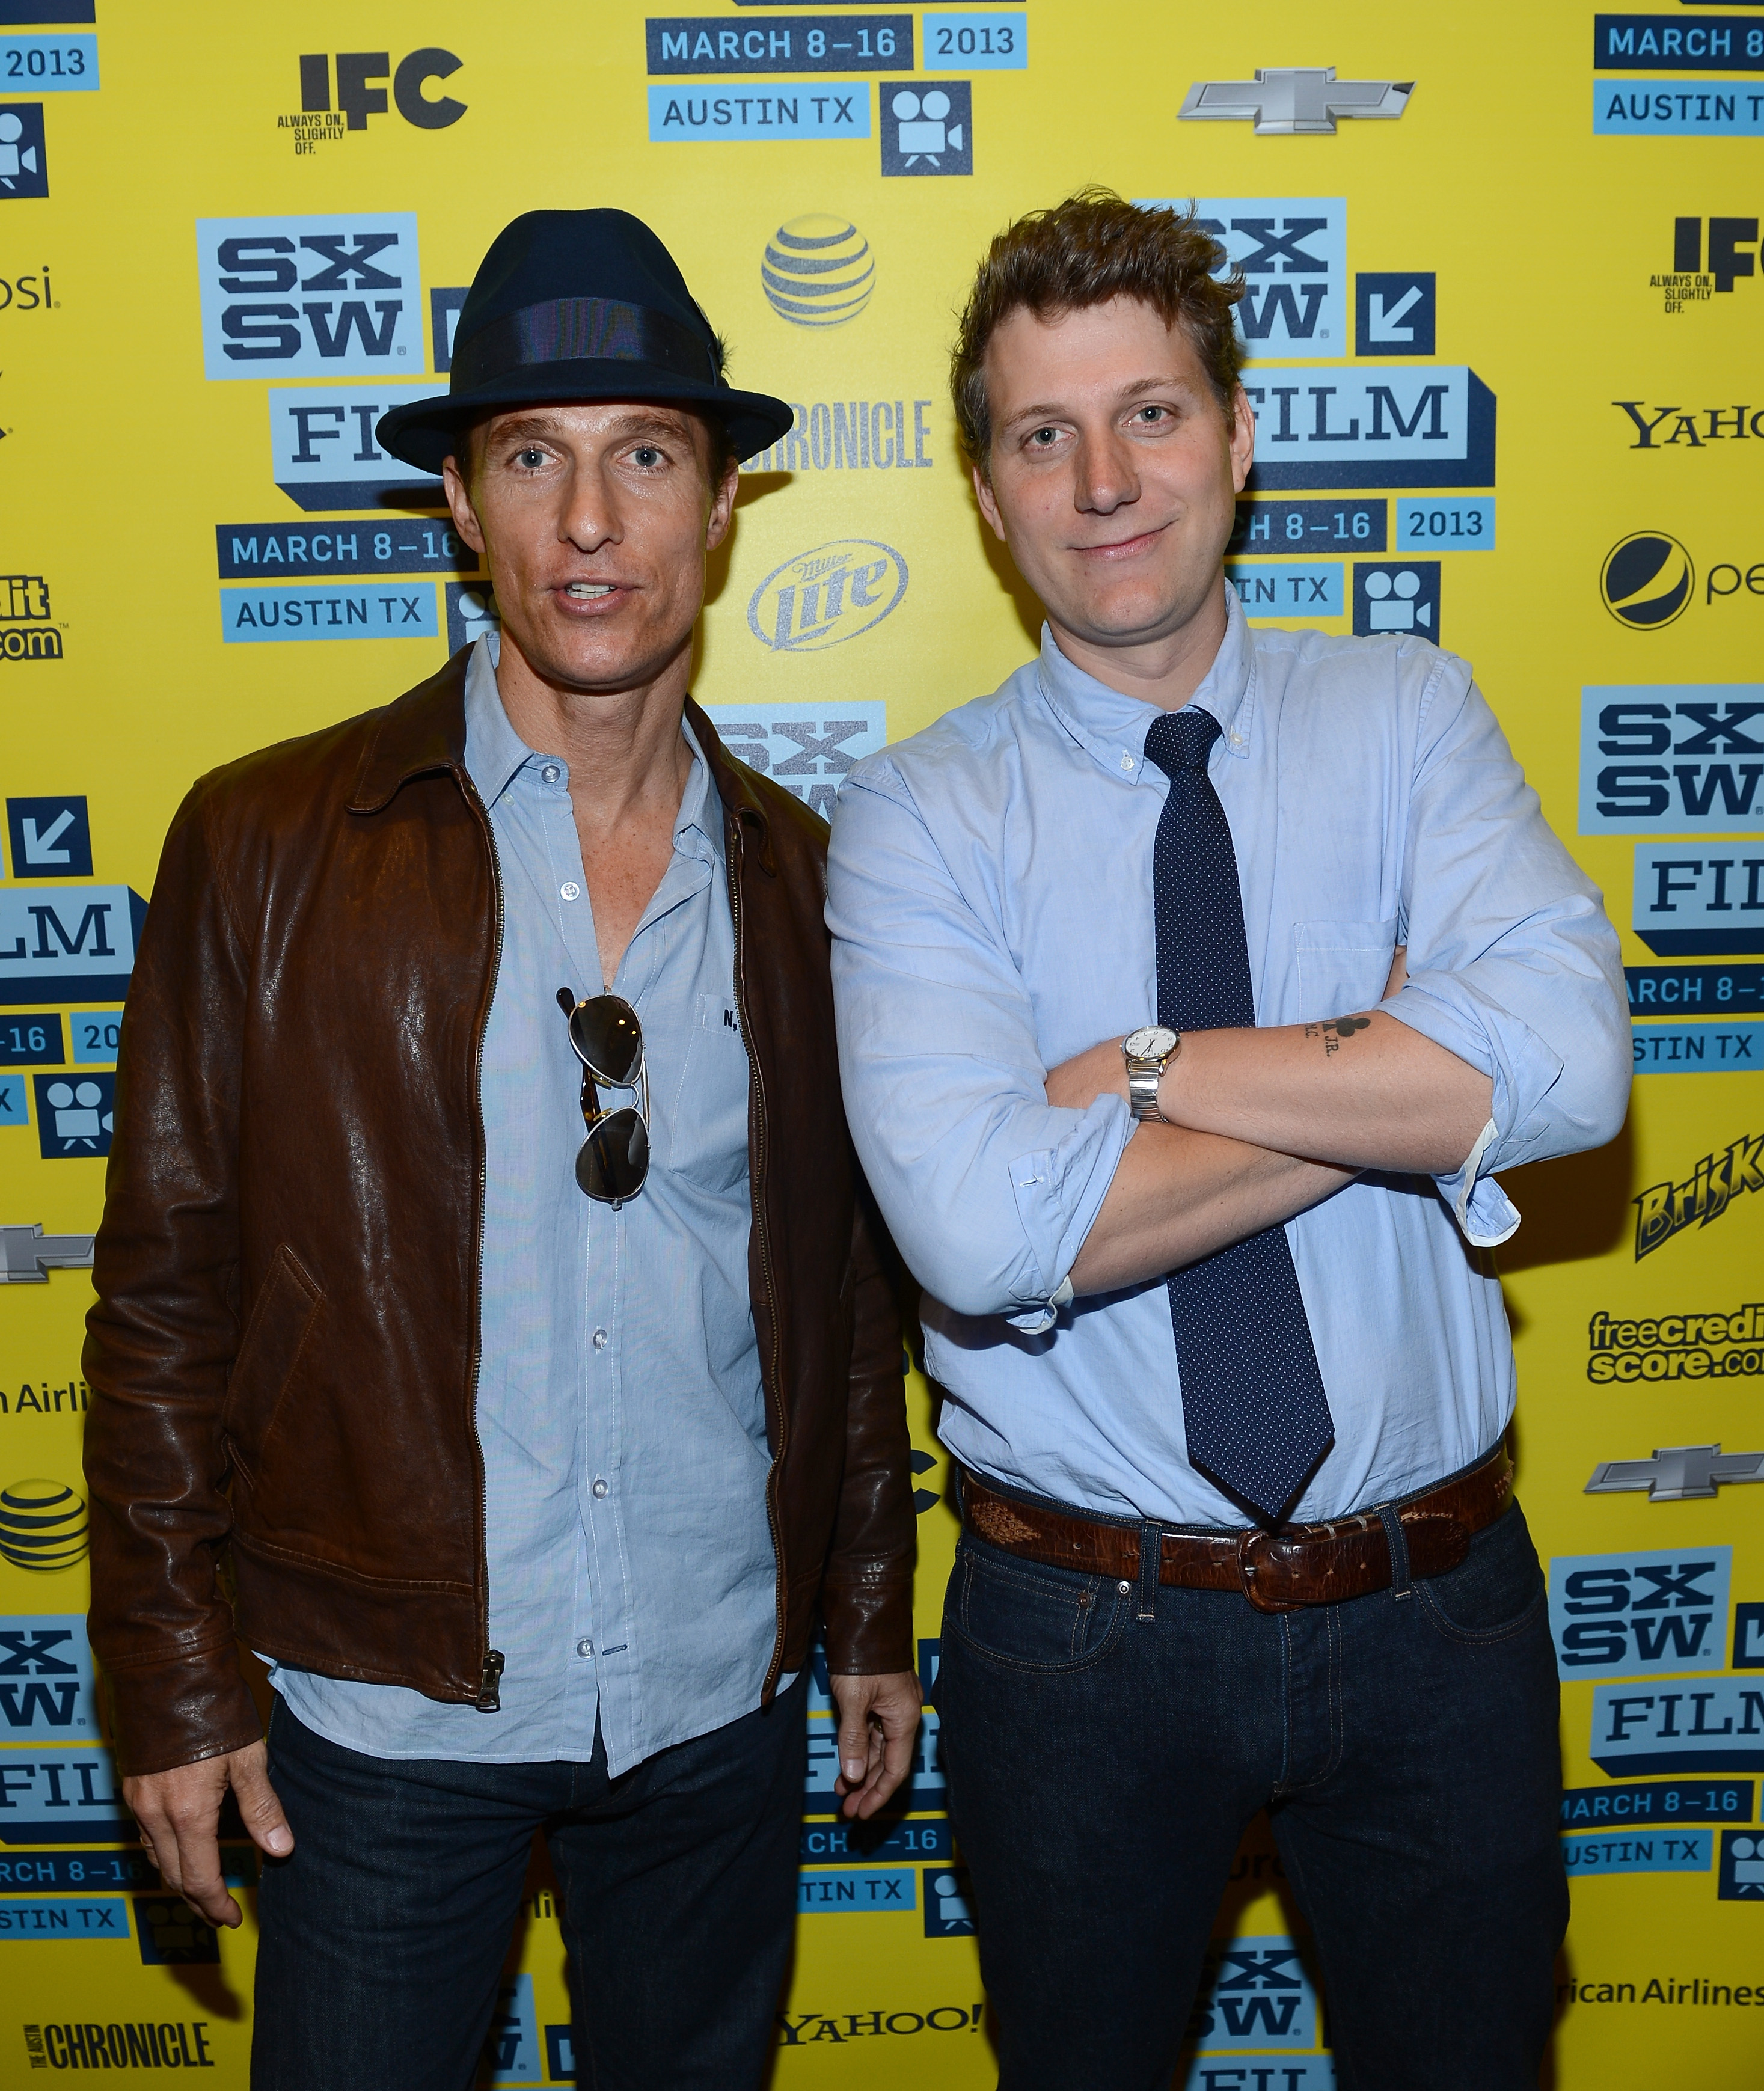 Matthew McConaughey and Jeff Nichols attended the Mud screening at SXSW.